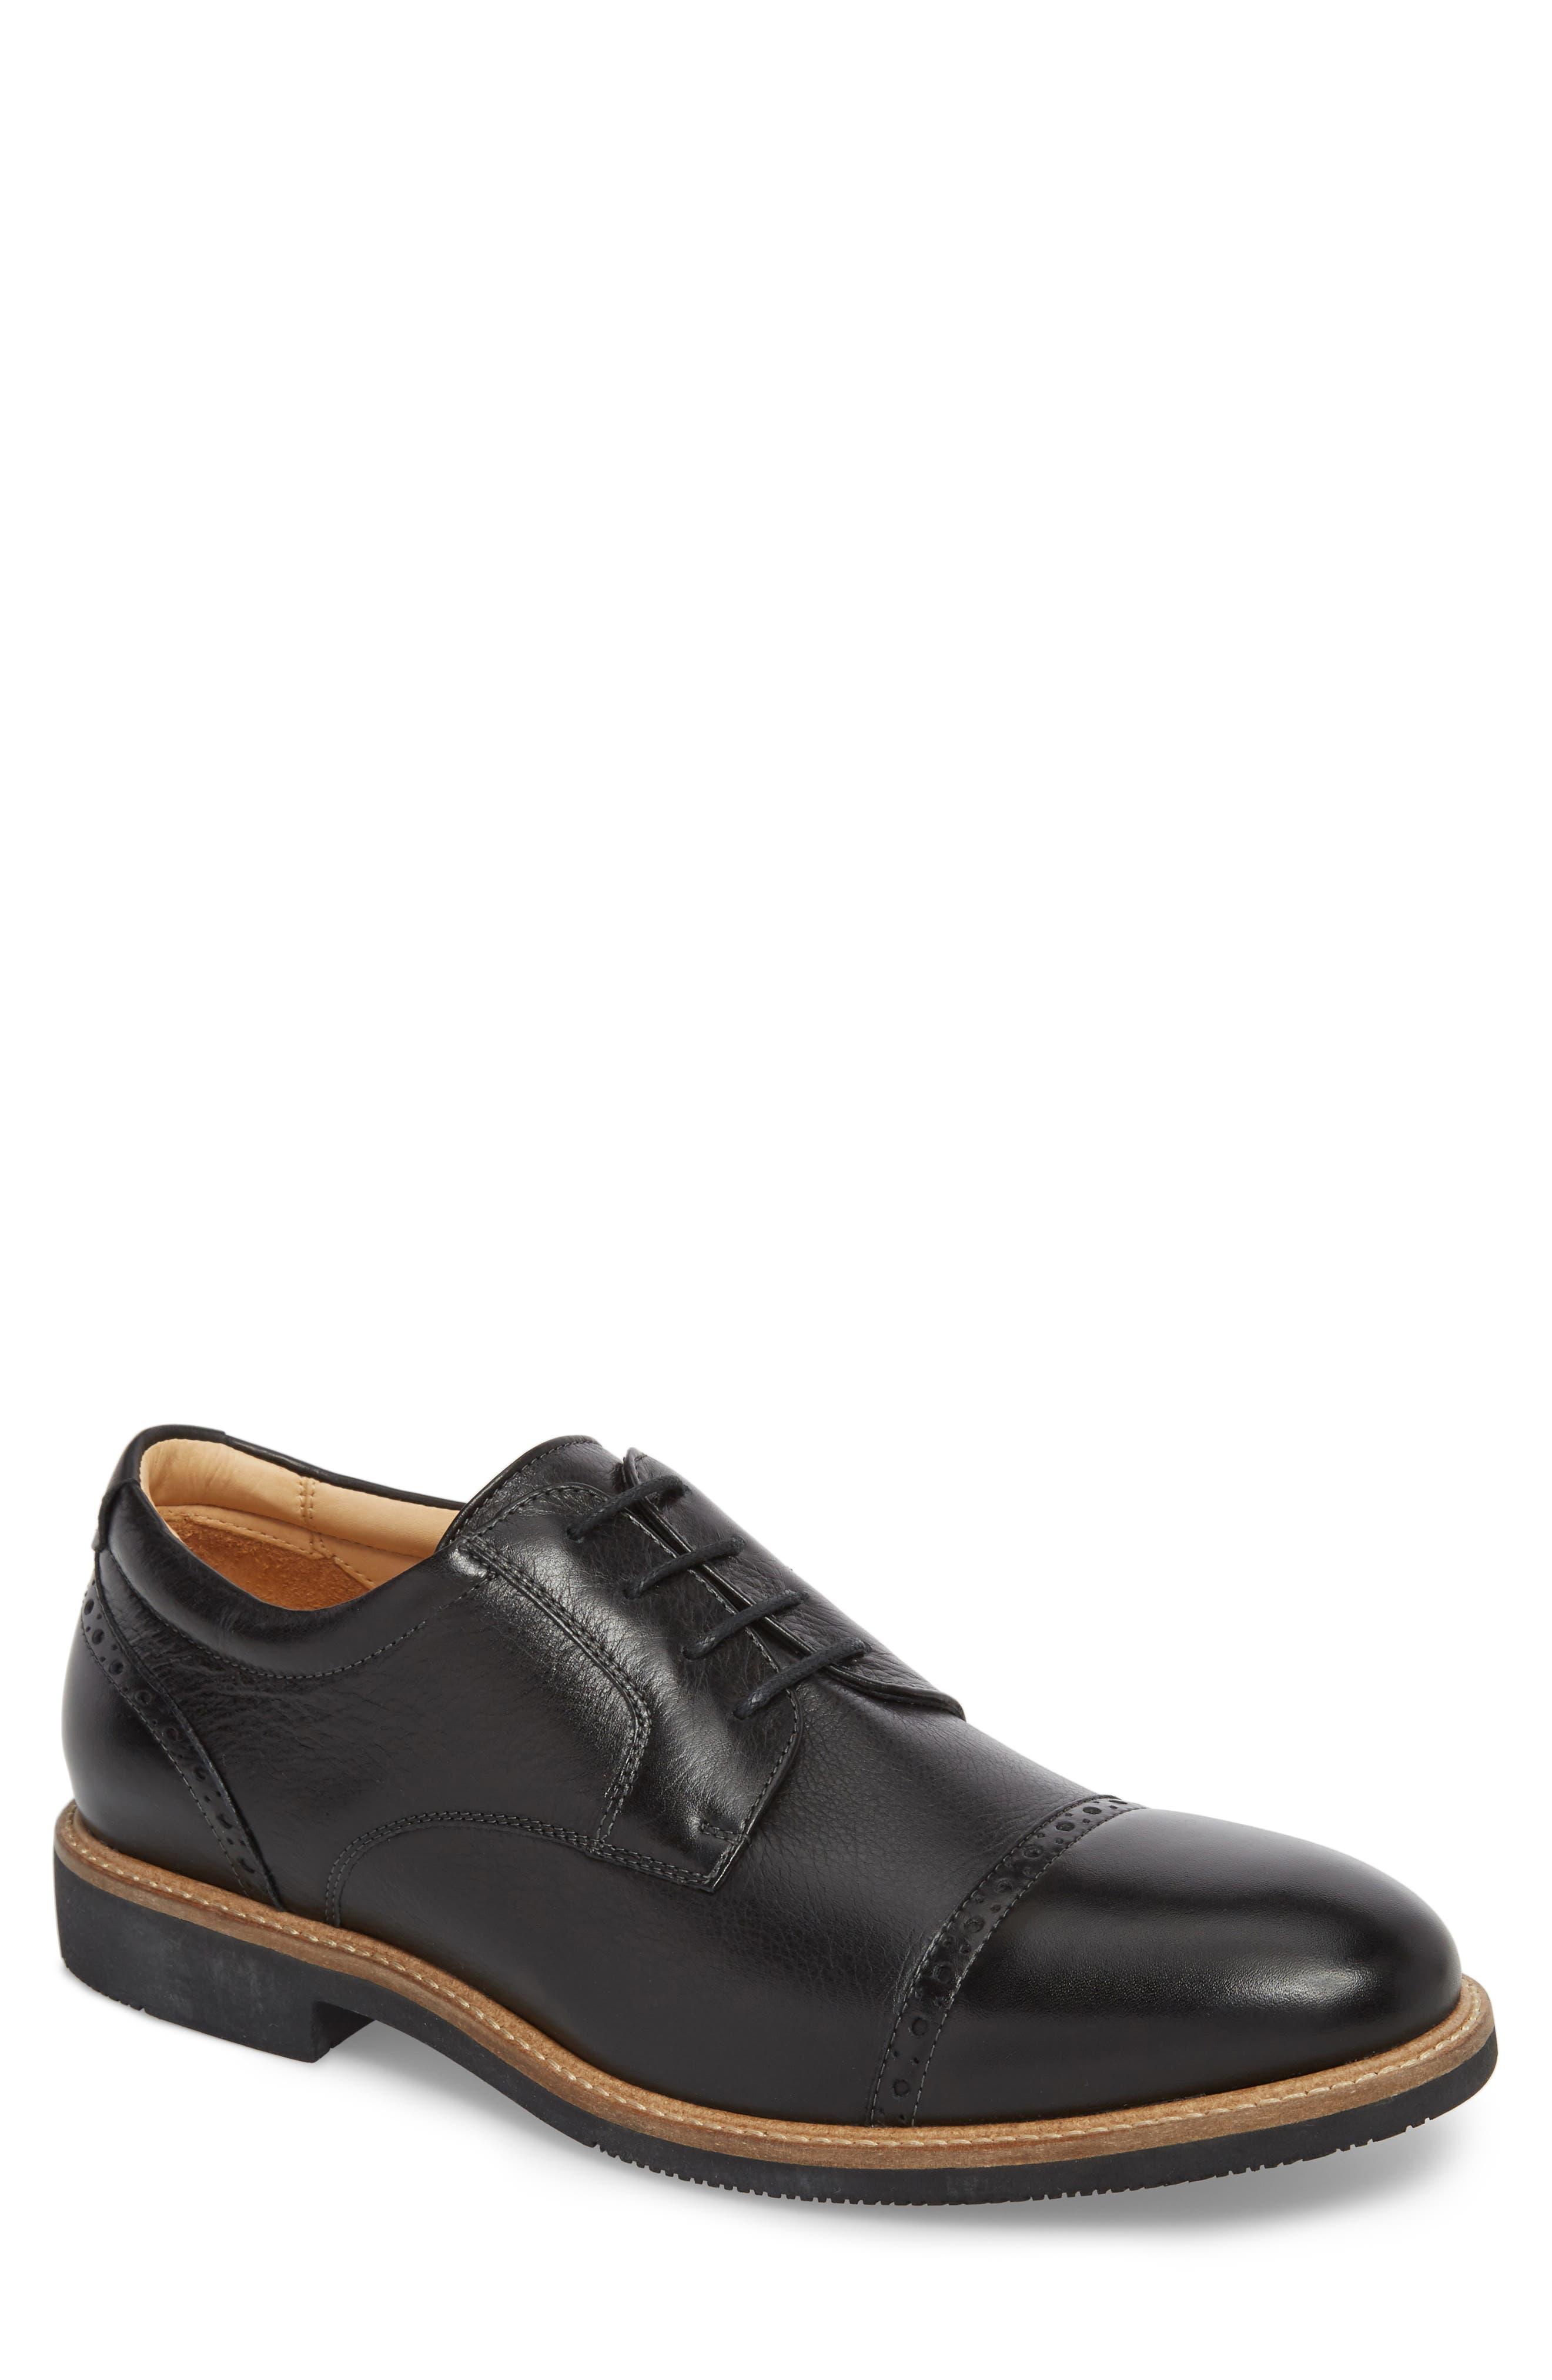 Barlow Cap Toe Derby,                             Main thumbnail 1, color,                             Black Leather